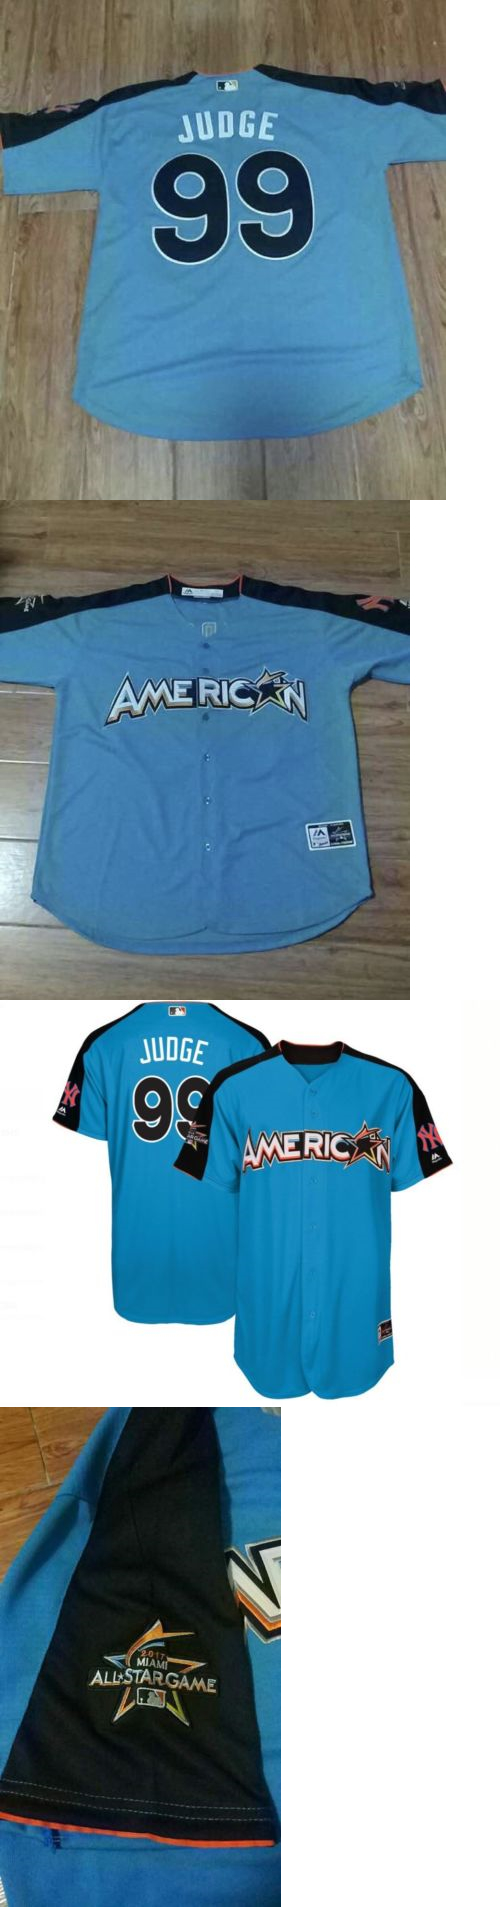 67426c944 ... Mens Sports Memorabilia Aaron Judge 99 American League 2017 Mlb All-Star  Game Jersey ... 2017 all star game new york yankees ...